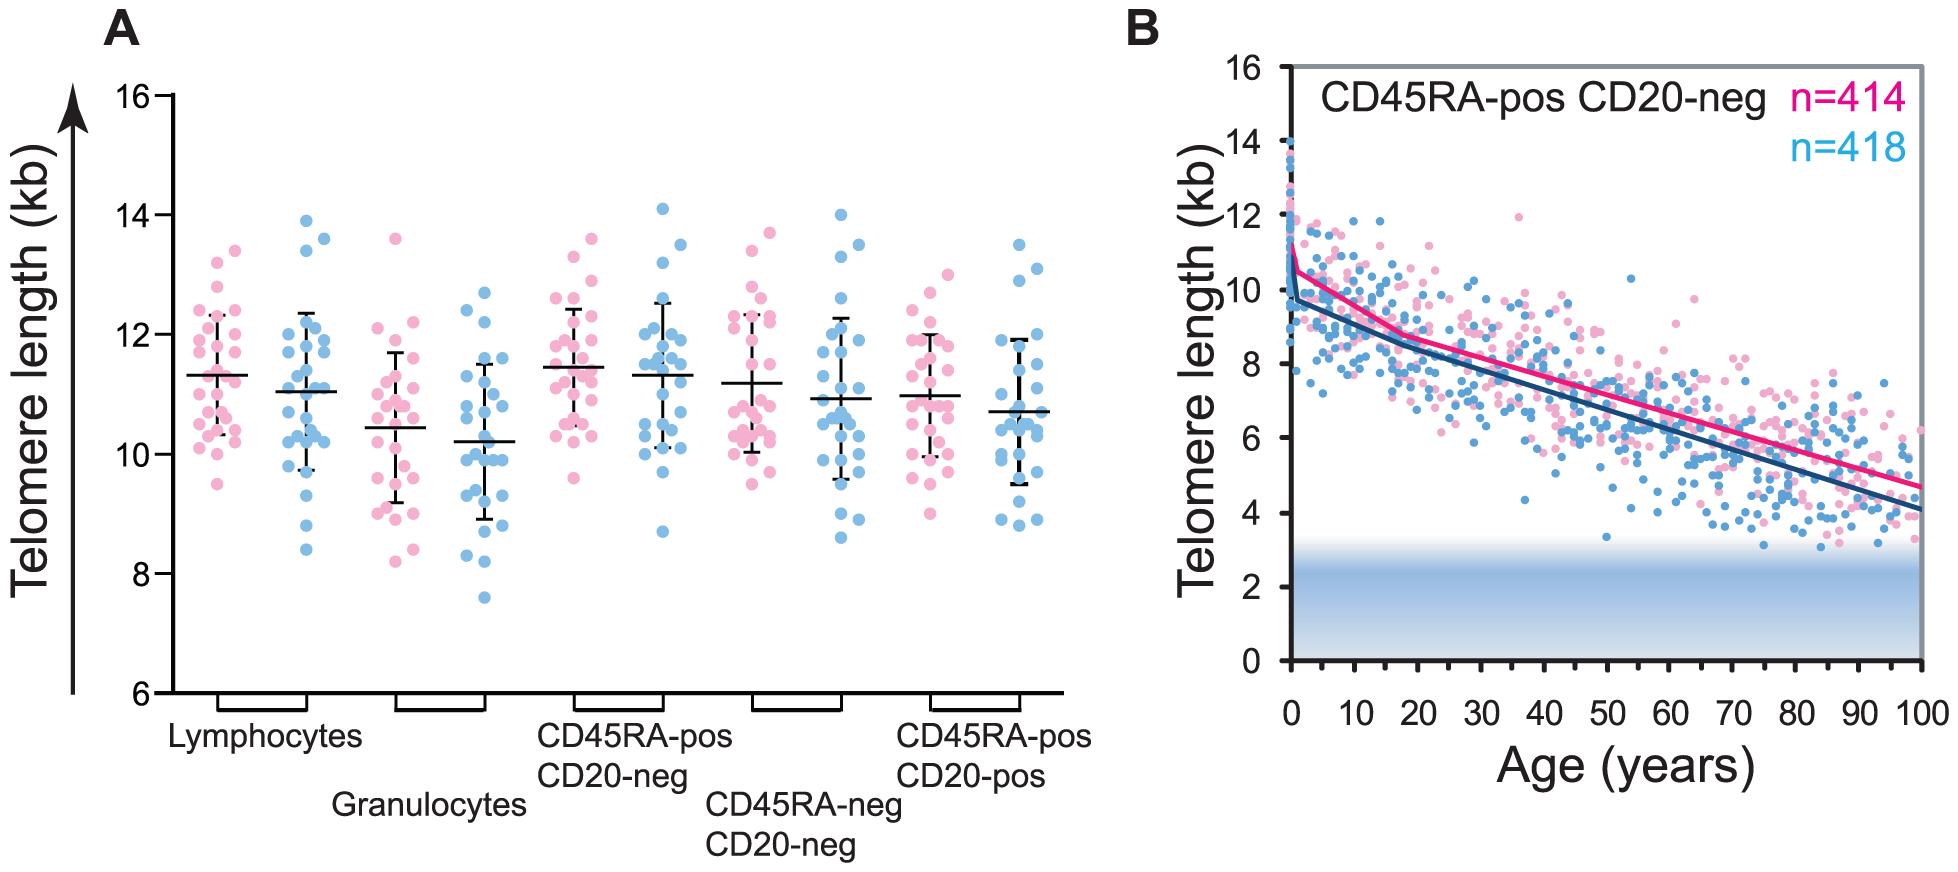 Gender differences in leukocyte telomere length.